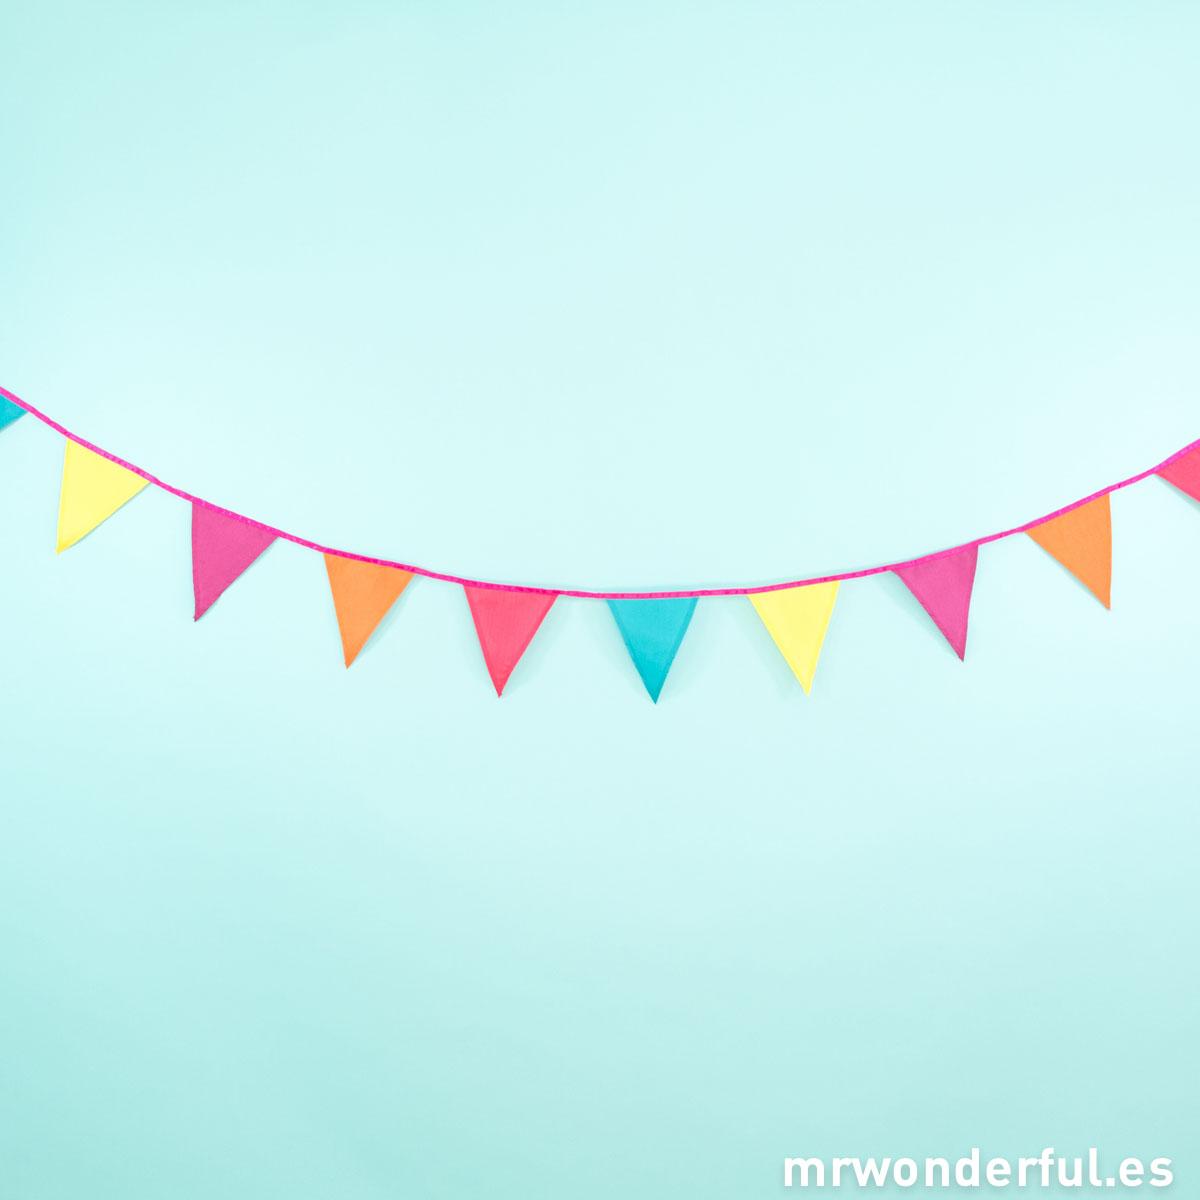 mrwonderful_DD-FABBUFI_guirnalda-banderines-colores-4